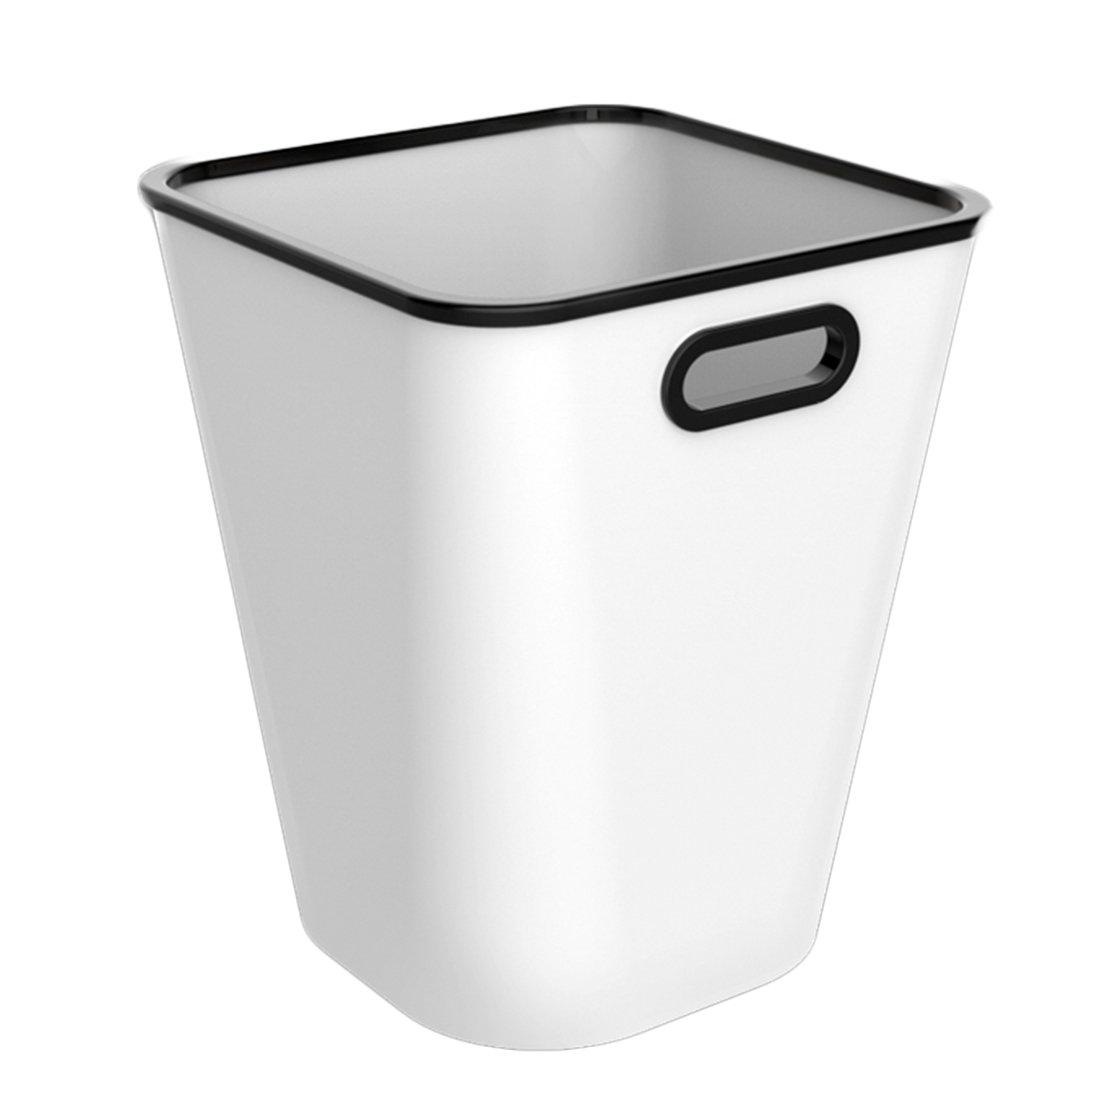 LoKauf 16L Waste Paper Bin Large Capacity Pressing Ring Plastic Trash Can Household Garbage Storage Bin